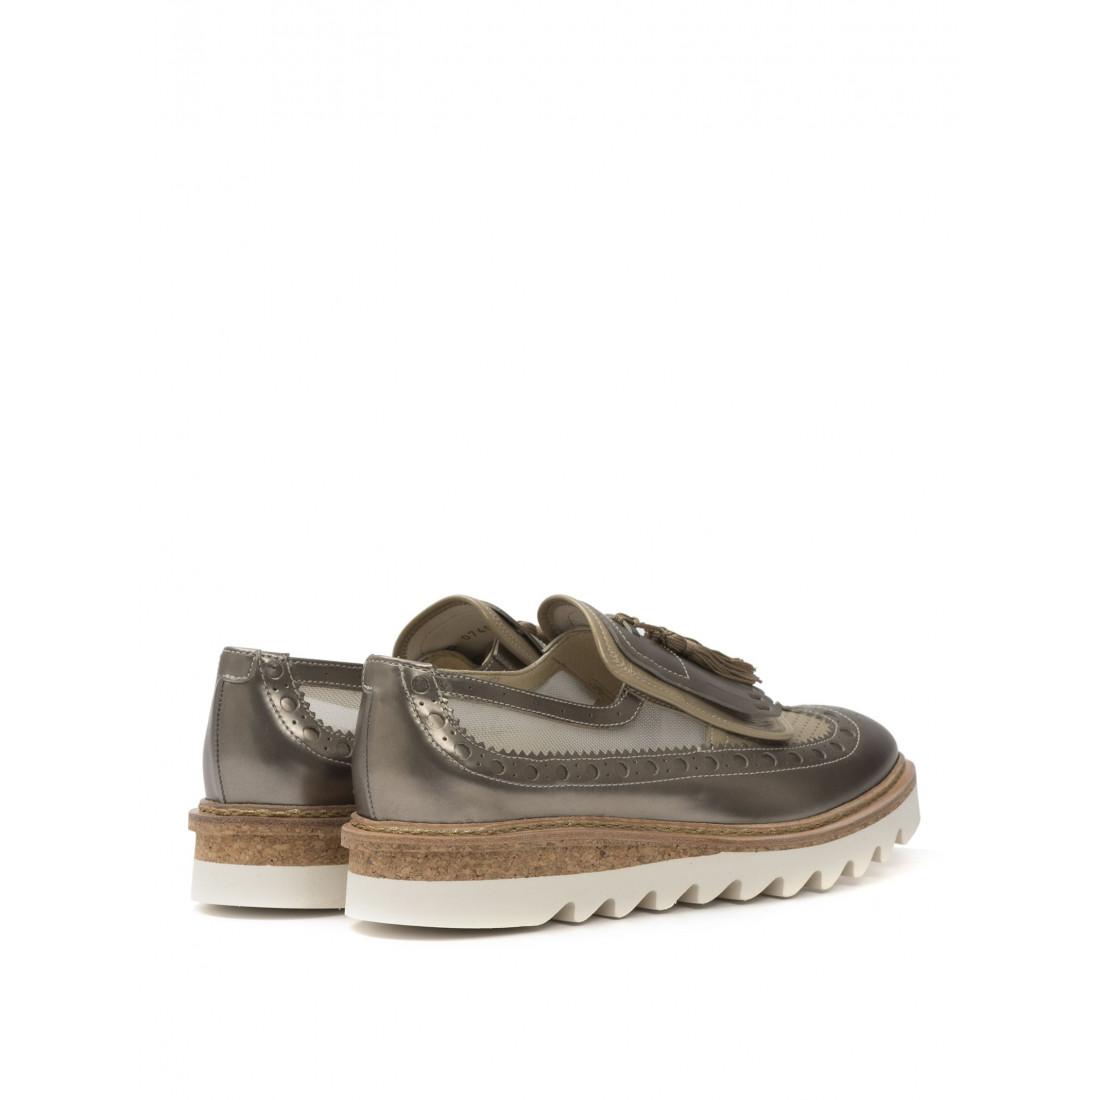 loafers woman barracuda bd0740 metal brw 1297